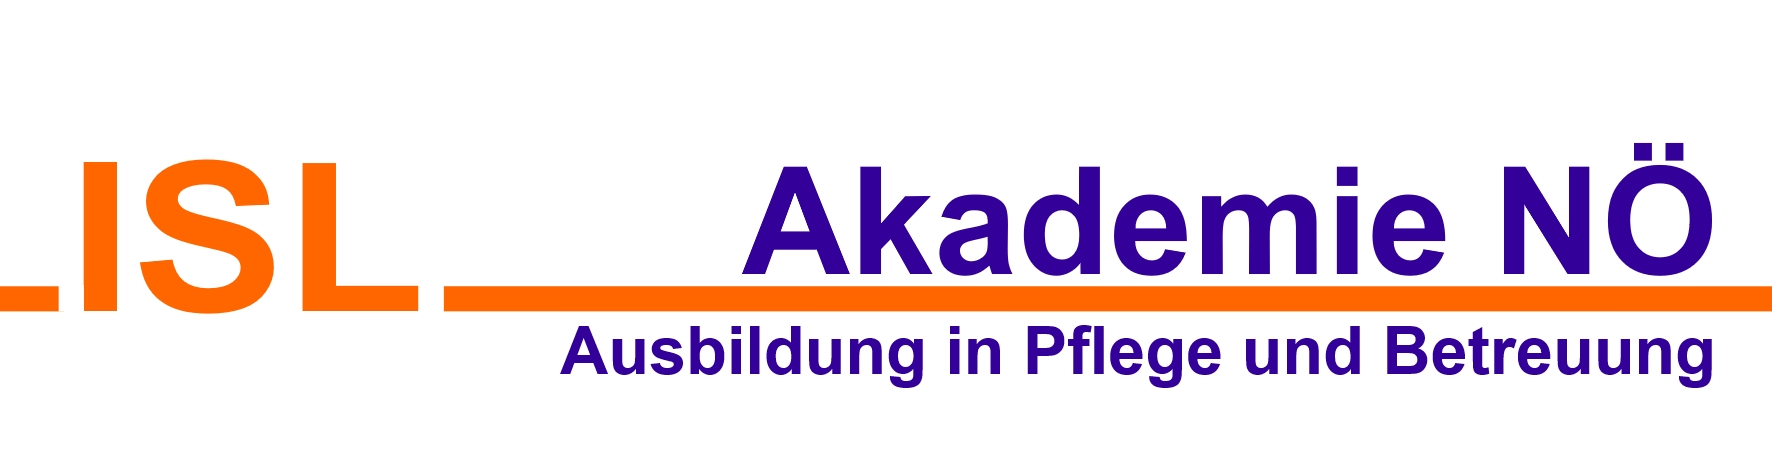 ISL-Akademie_Logo_rechts